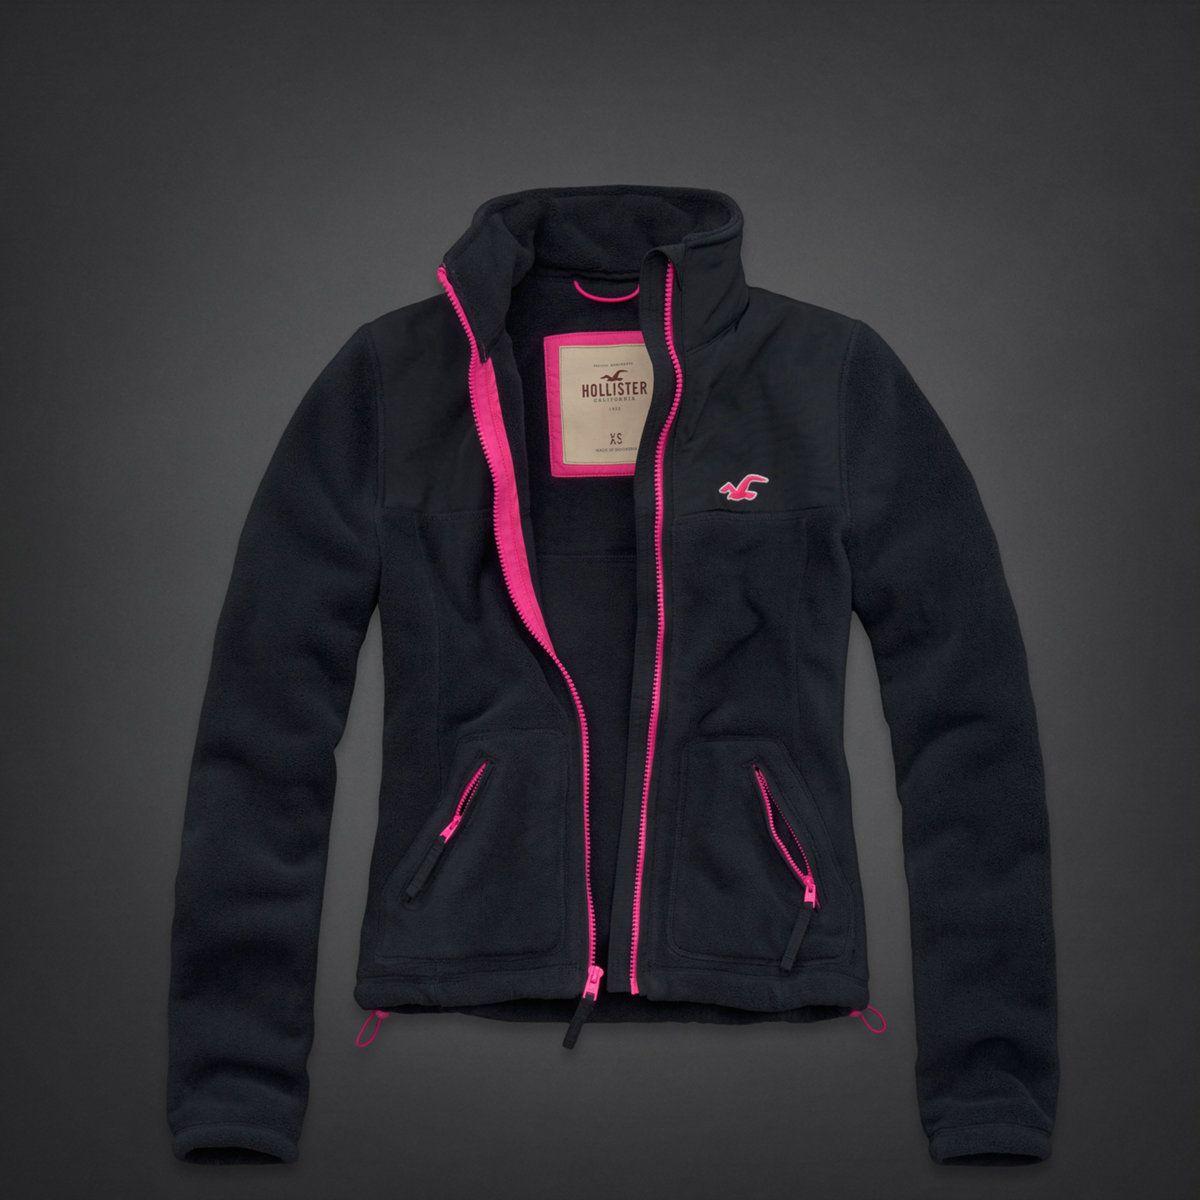 hollister fleece jacket